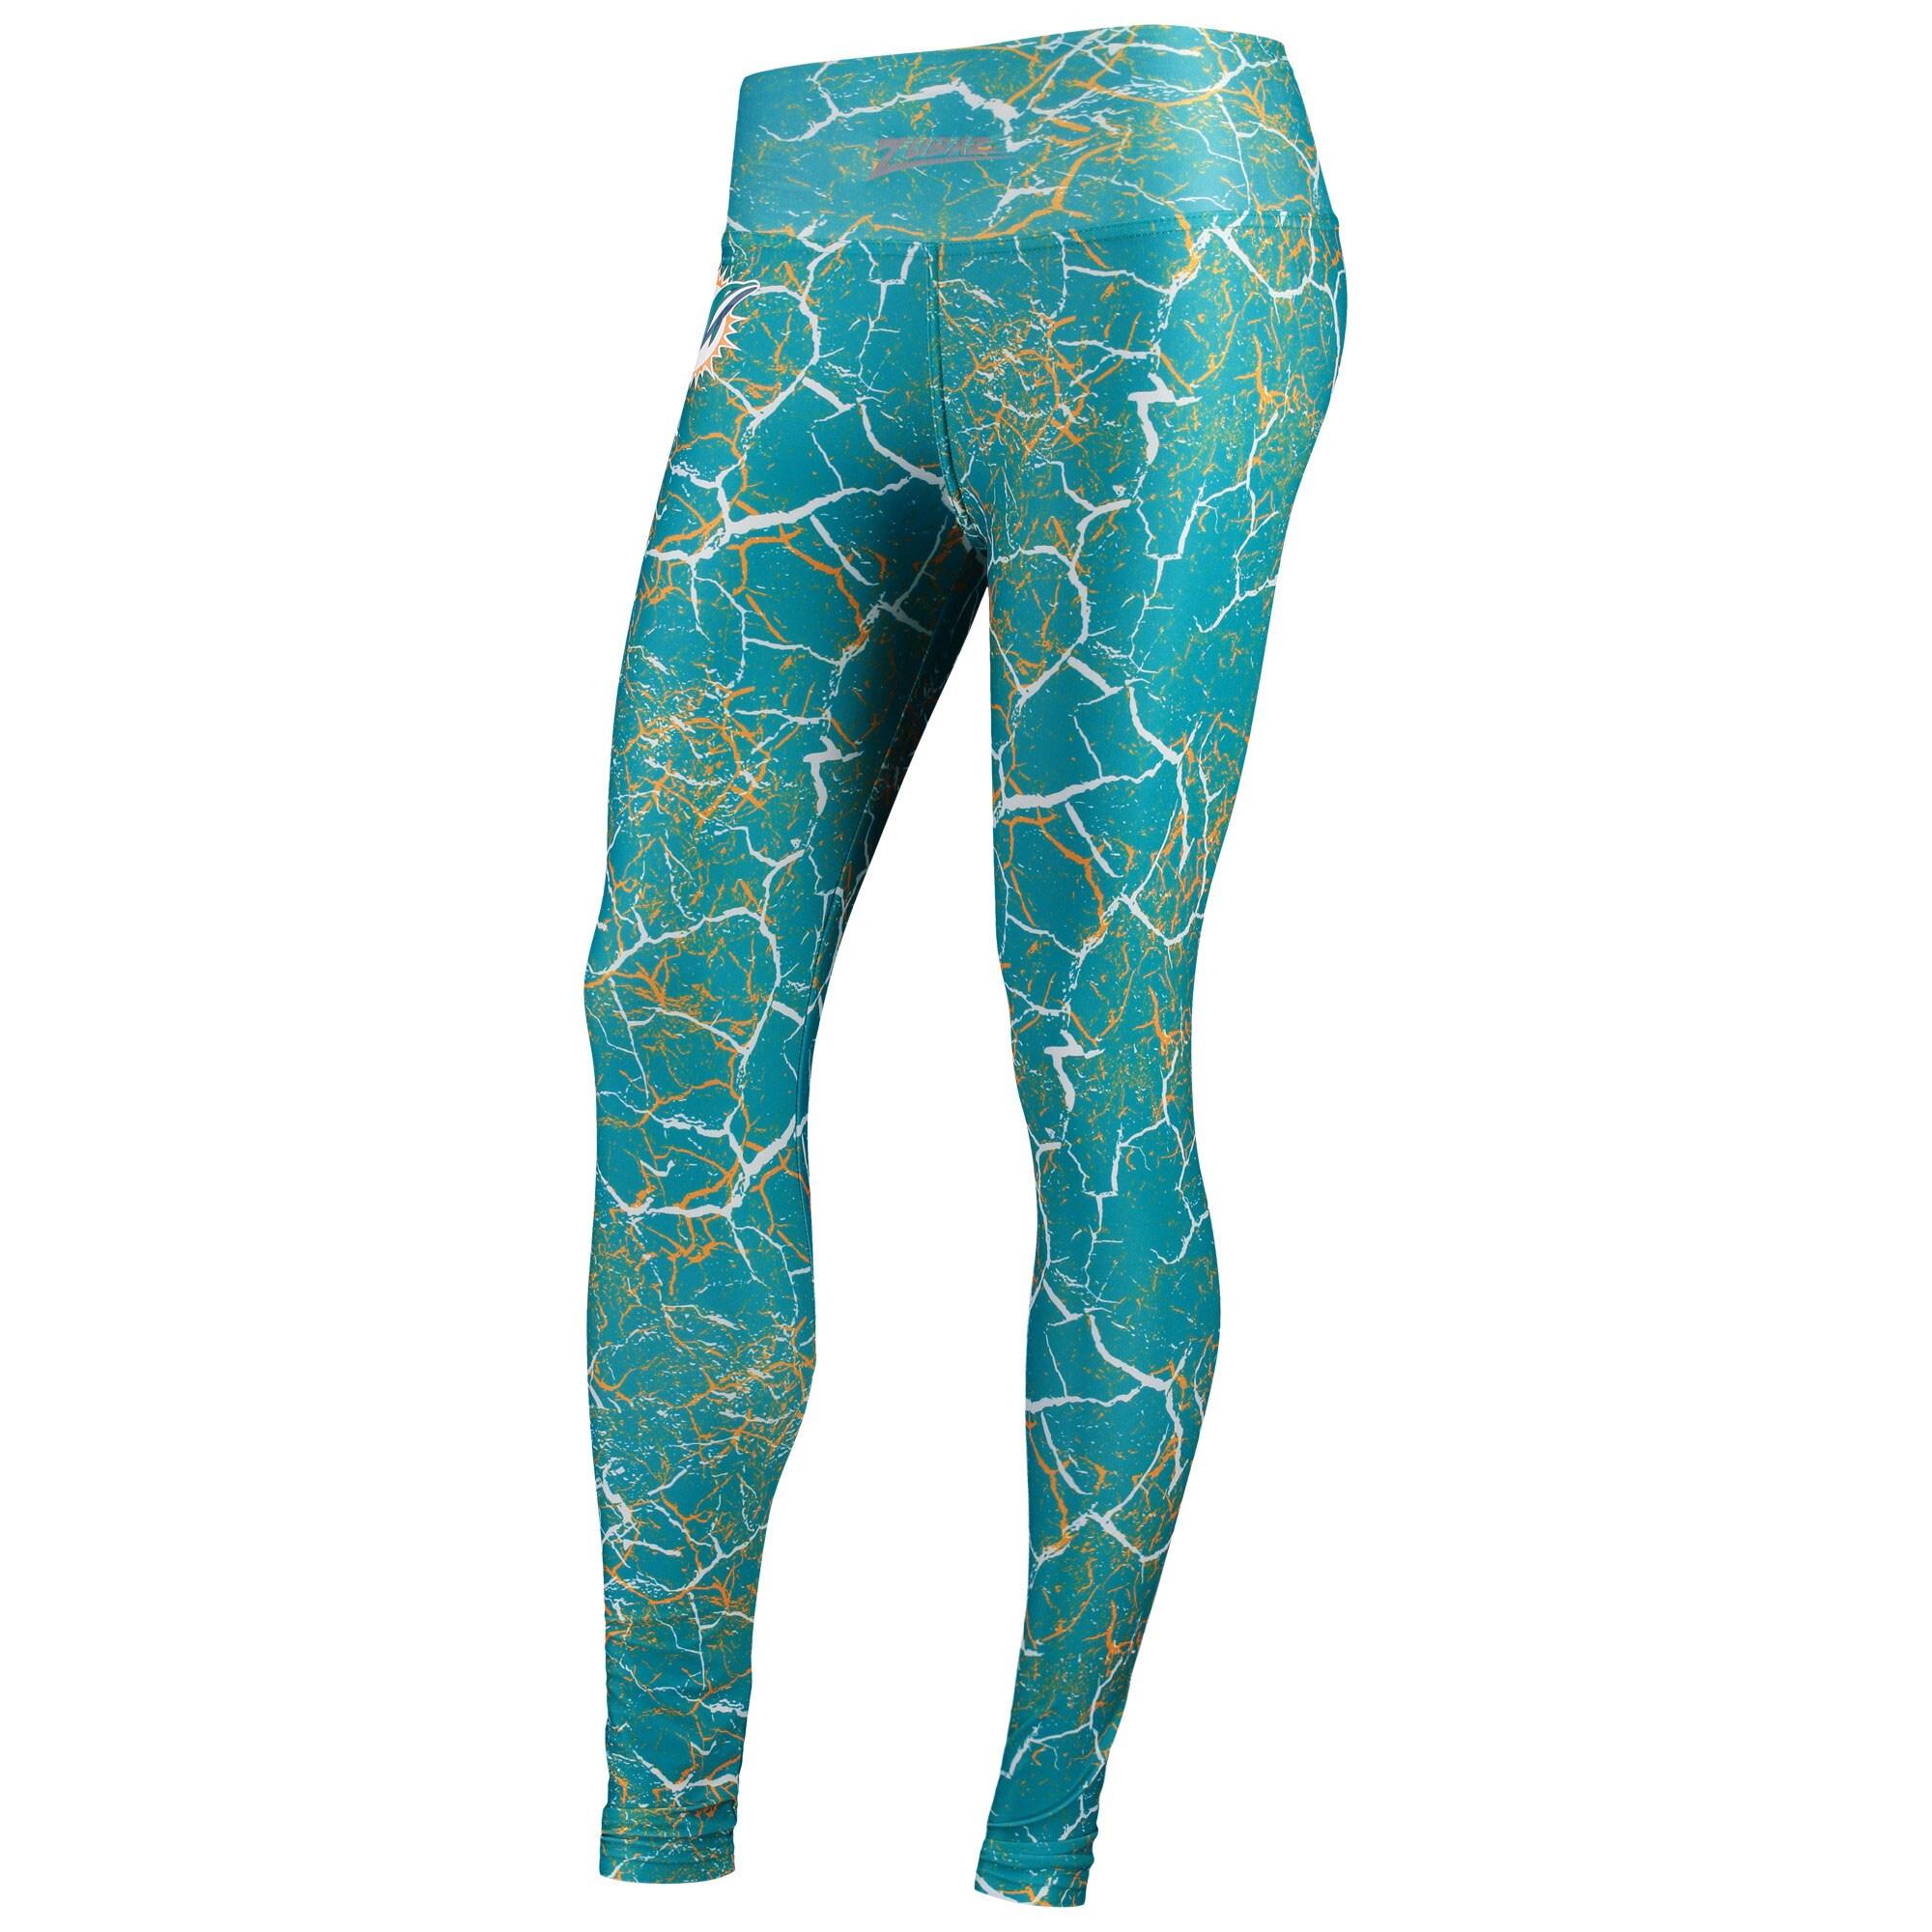 Miami Dolphins Zubaz Women's Marble Leggings - Aqua/Orange